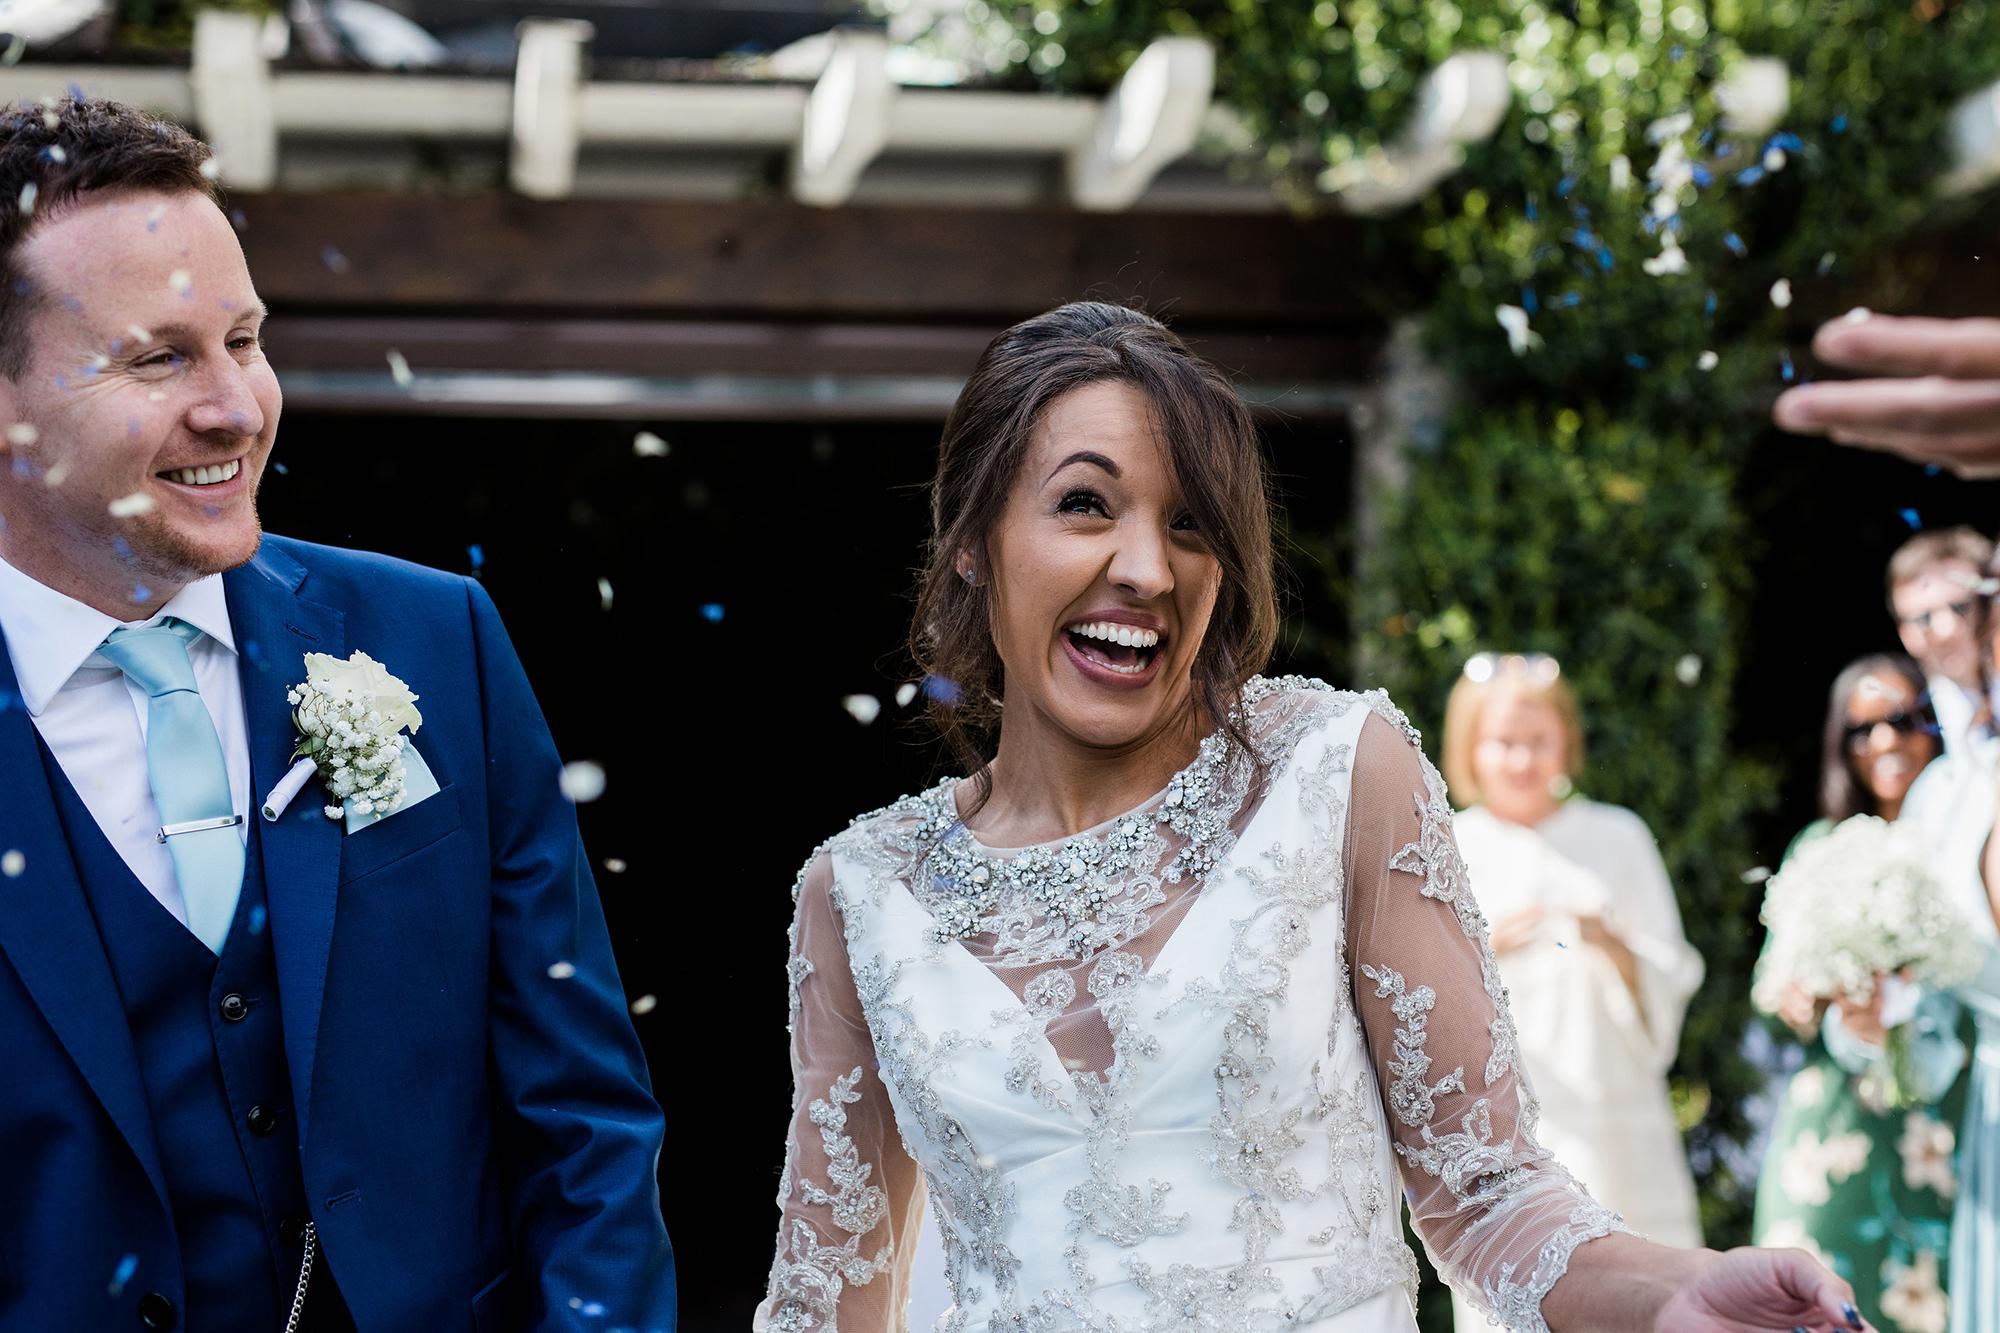 Your_Wedding_Day_170.jpg